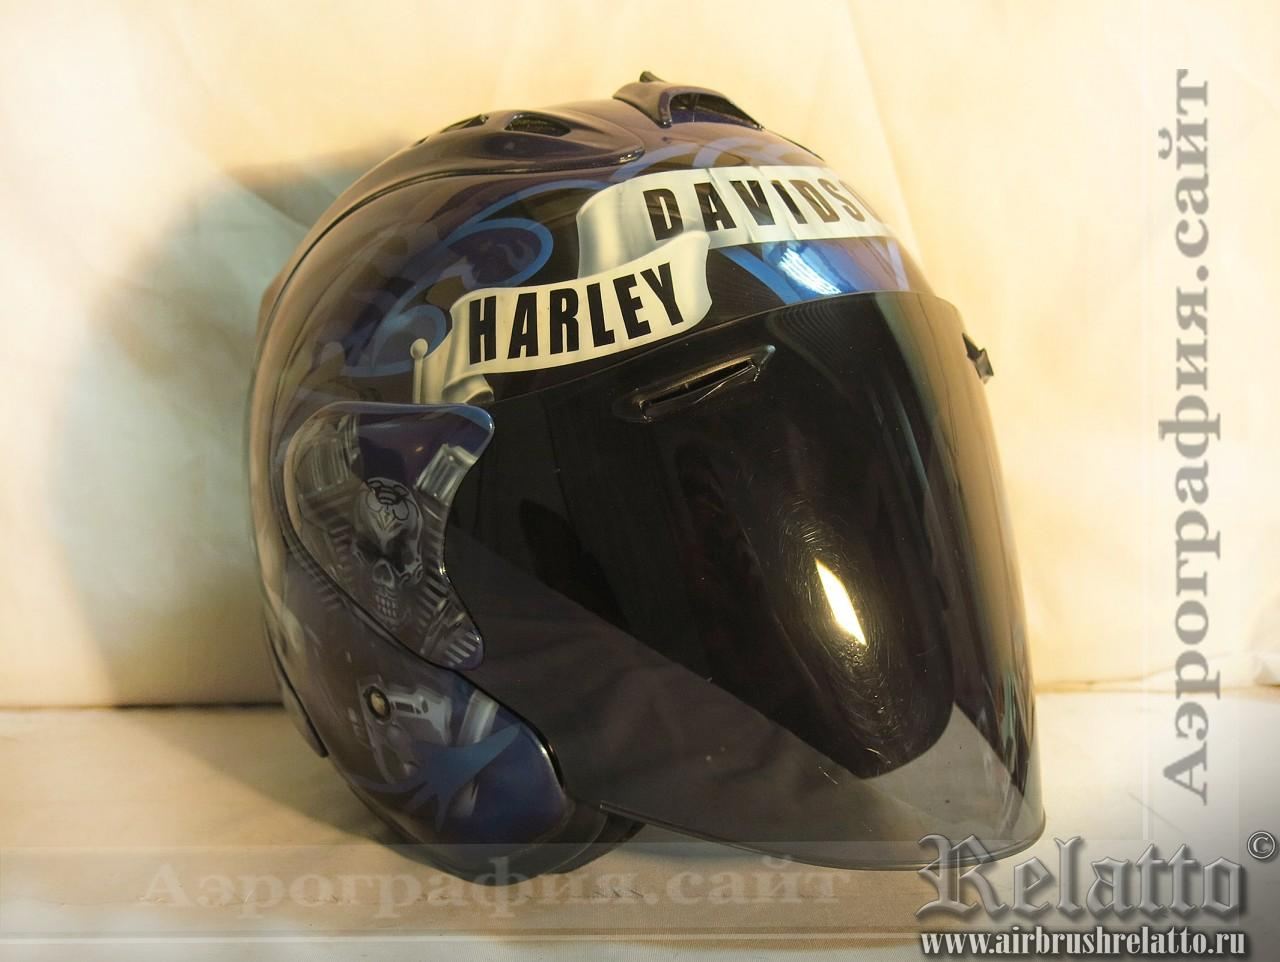 Аэрография шлема Arai Hey Harley